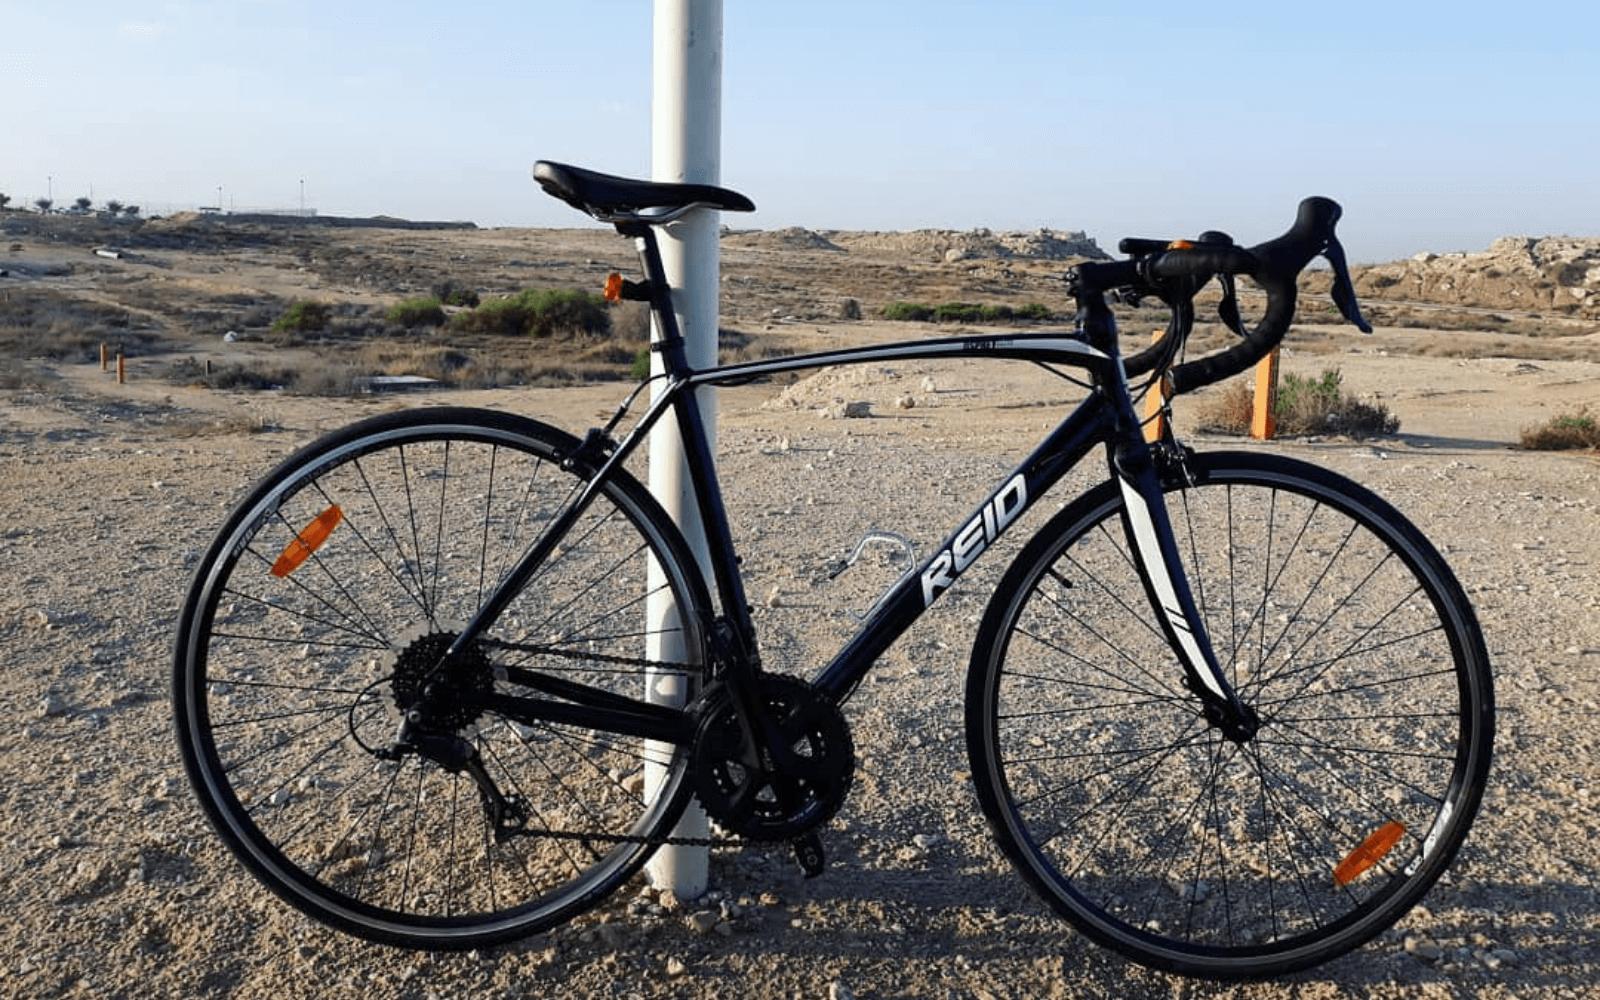 Copy of Copy of Lifestyle images 43 1 - Reid ® - Osprey Drop Bar Bike